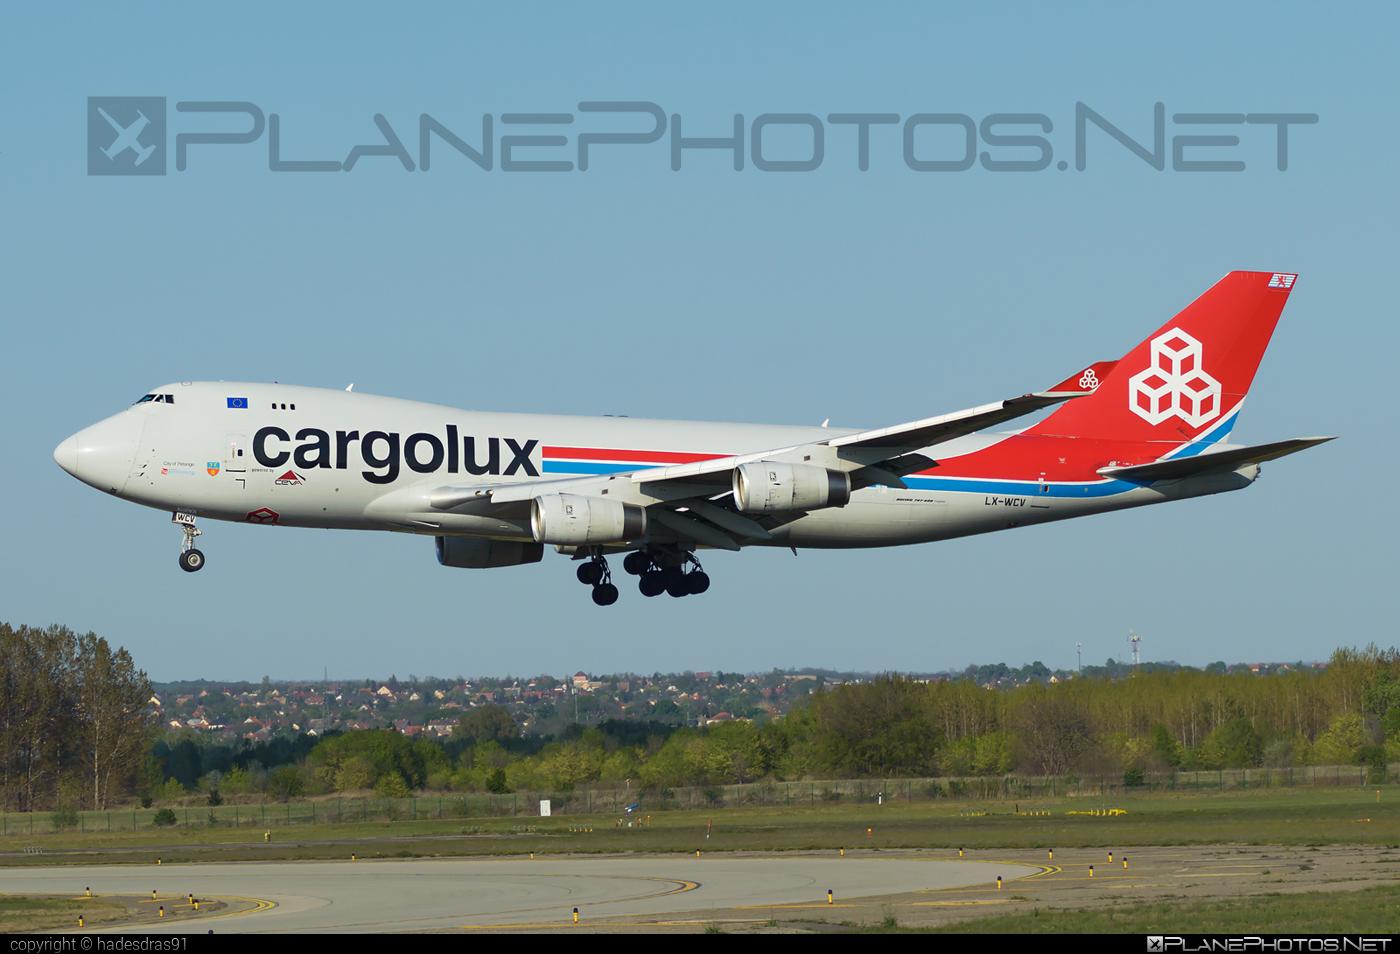 Boeing 747-400F - LX-WCV operated by Cargolux Airlines International #b747 #boeing #boeing747 #cargolux #jumbo